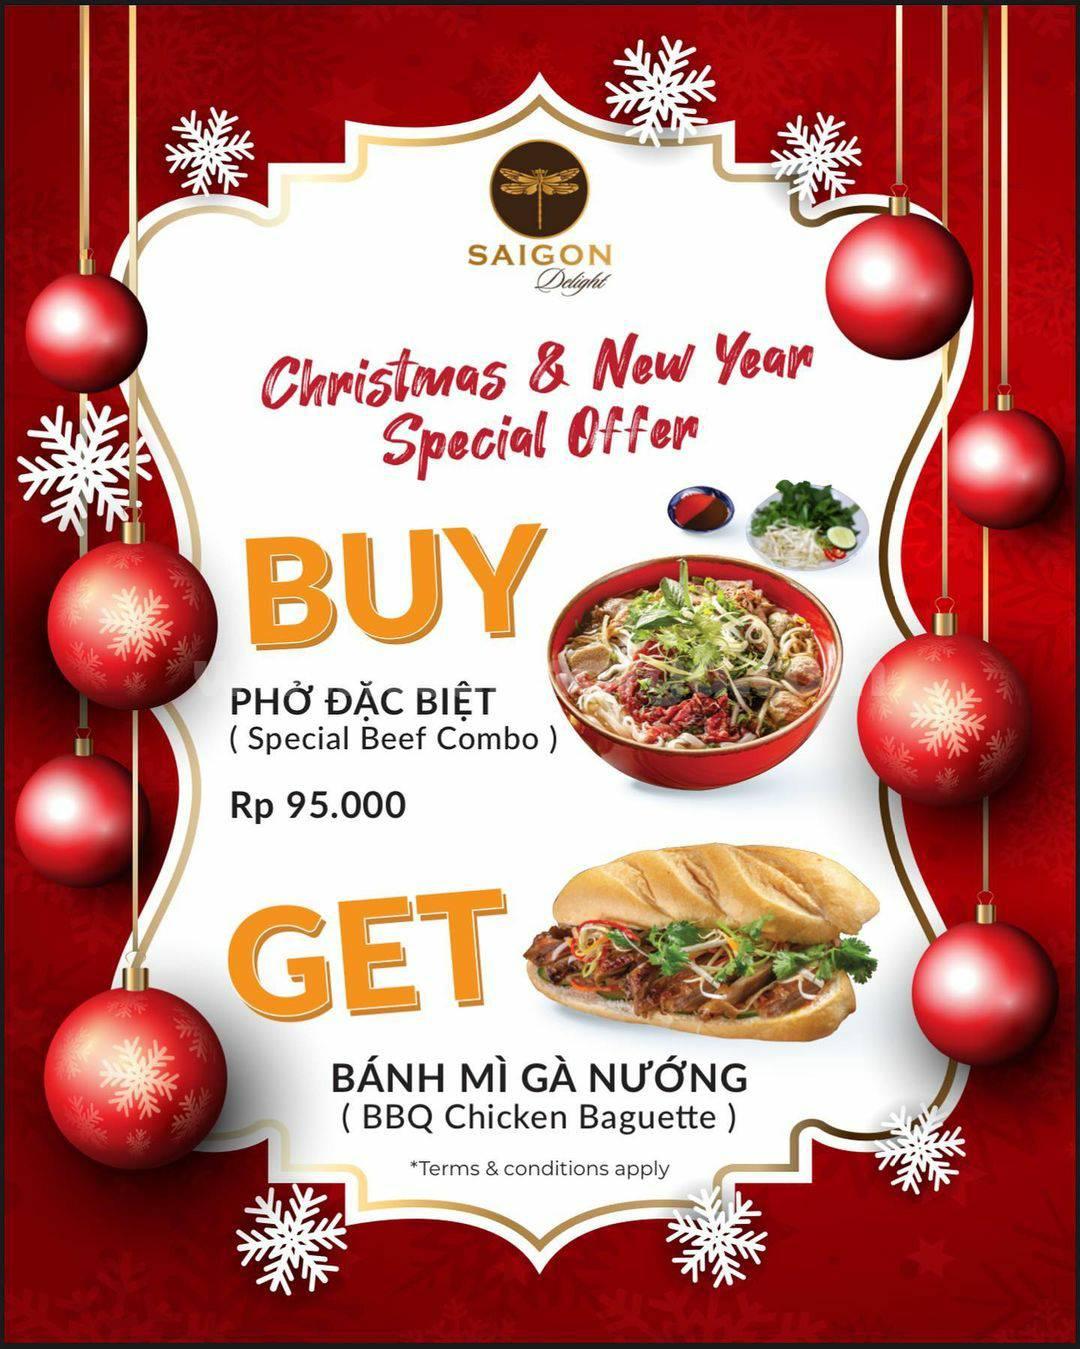 Saigon Delight Christmas & New Year Special Offer – Promo Beli Pho GRATIS Bahn Mi